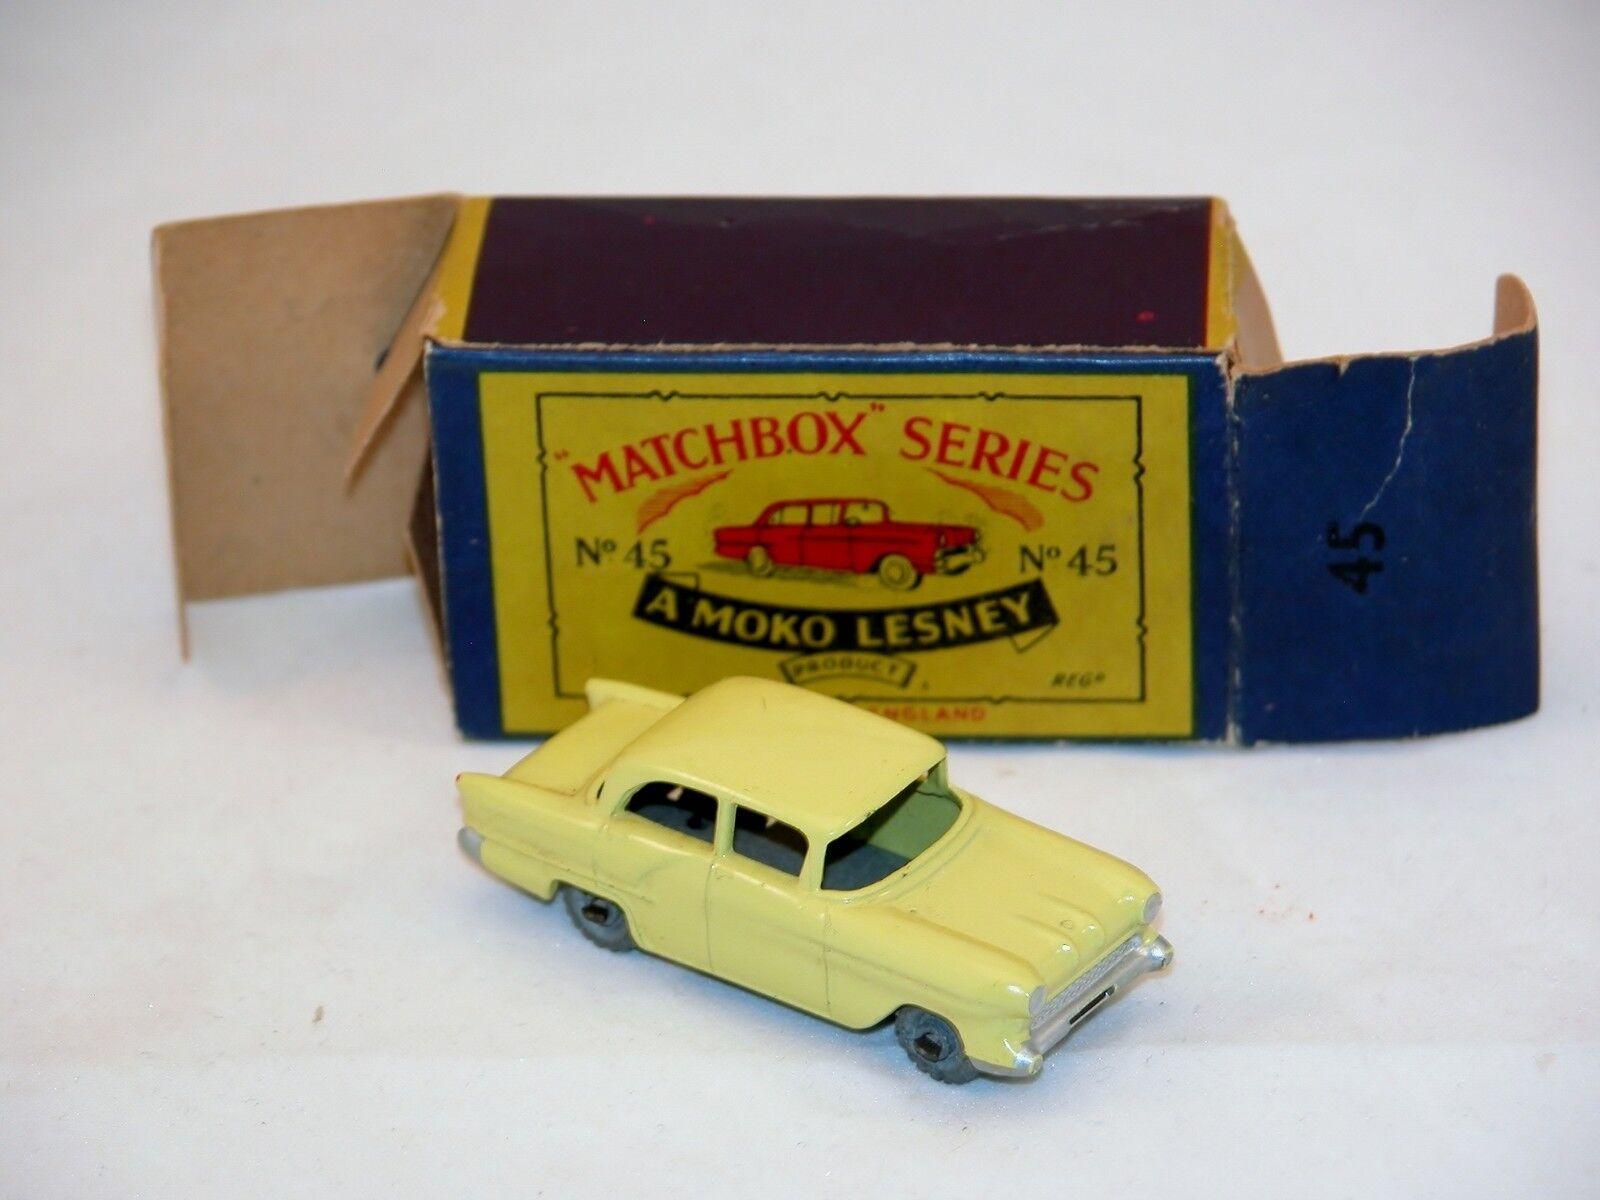 Matchbox Moko Lesney  N° 45  Vauxhall N Mint avec Boite  rare  ( MBA)